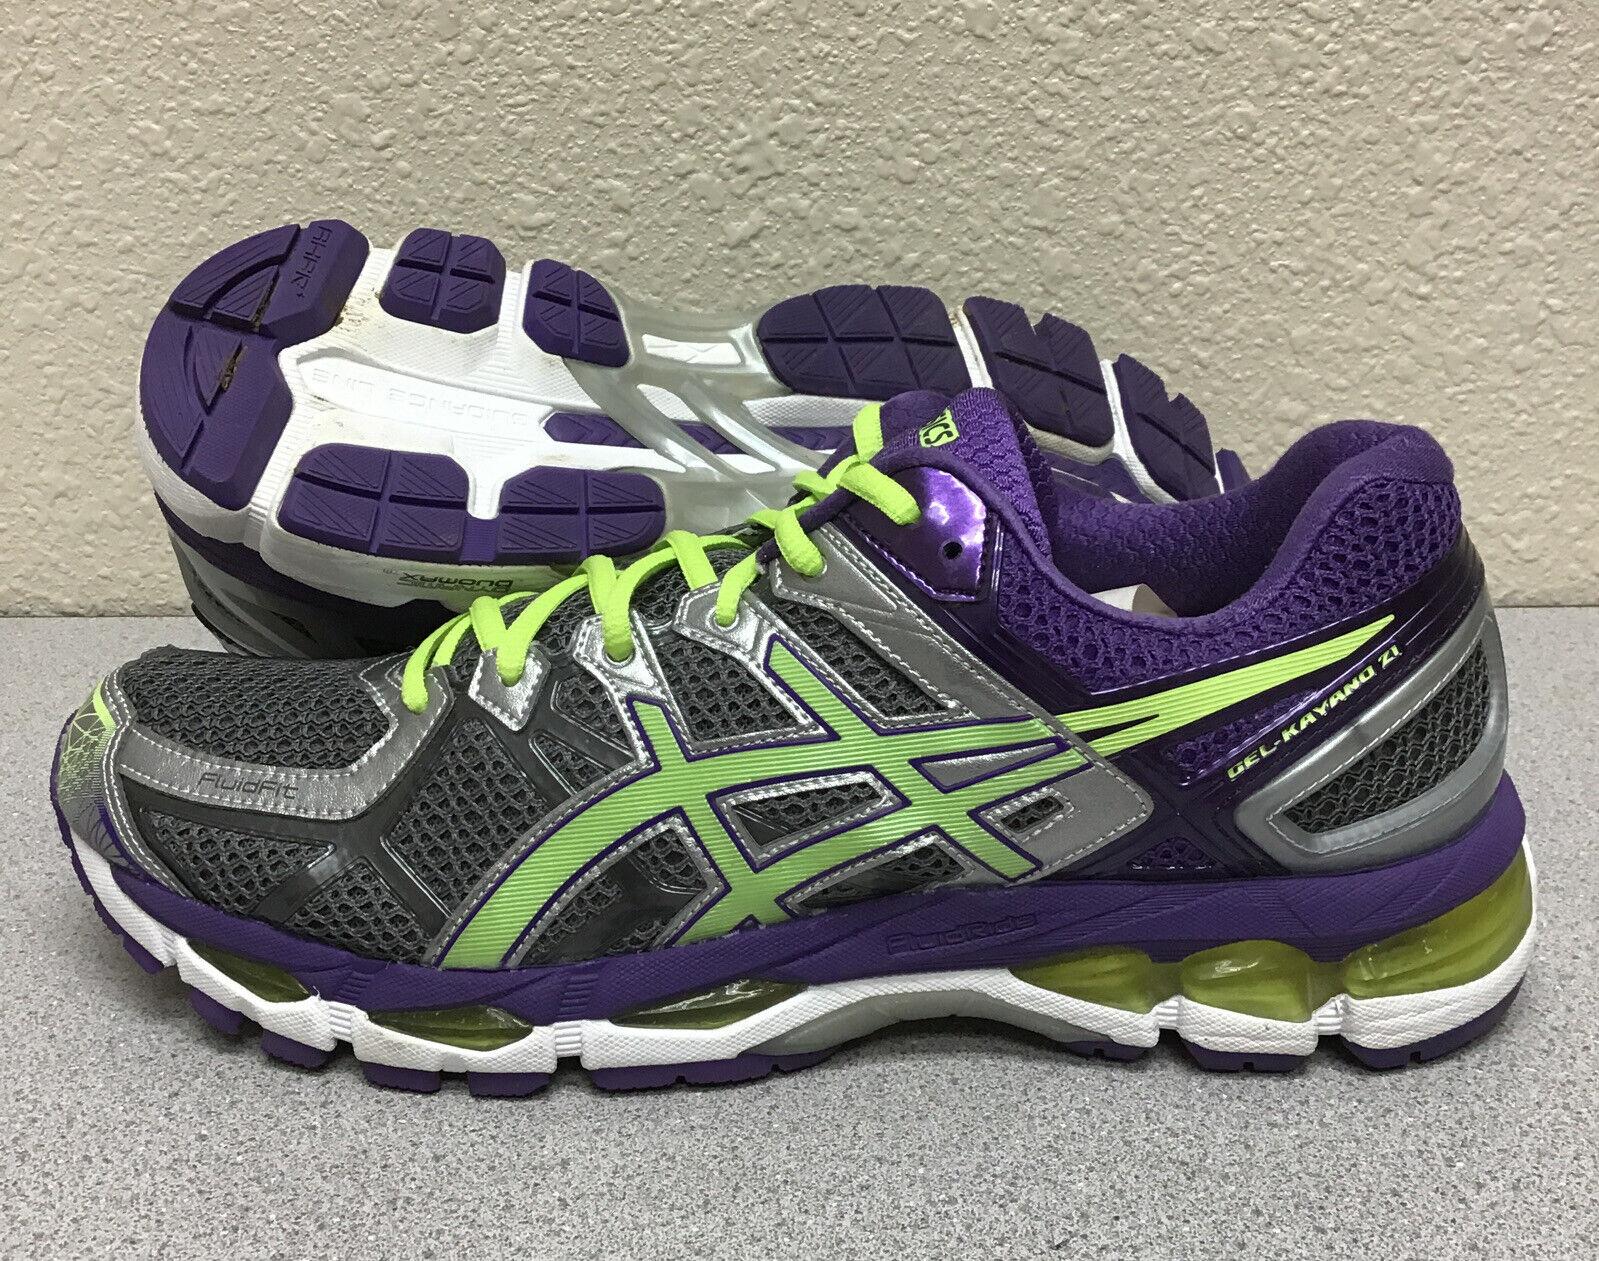 esposa oportunidad Antología  ASICS Women's Gel-190 TR Cross-training Shoe for sale online | eBay